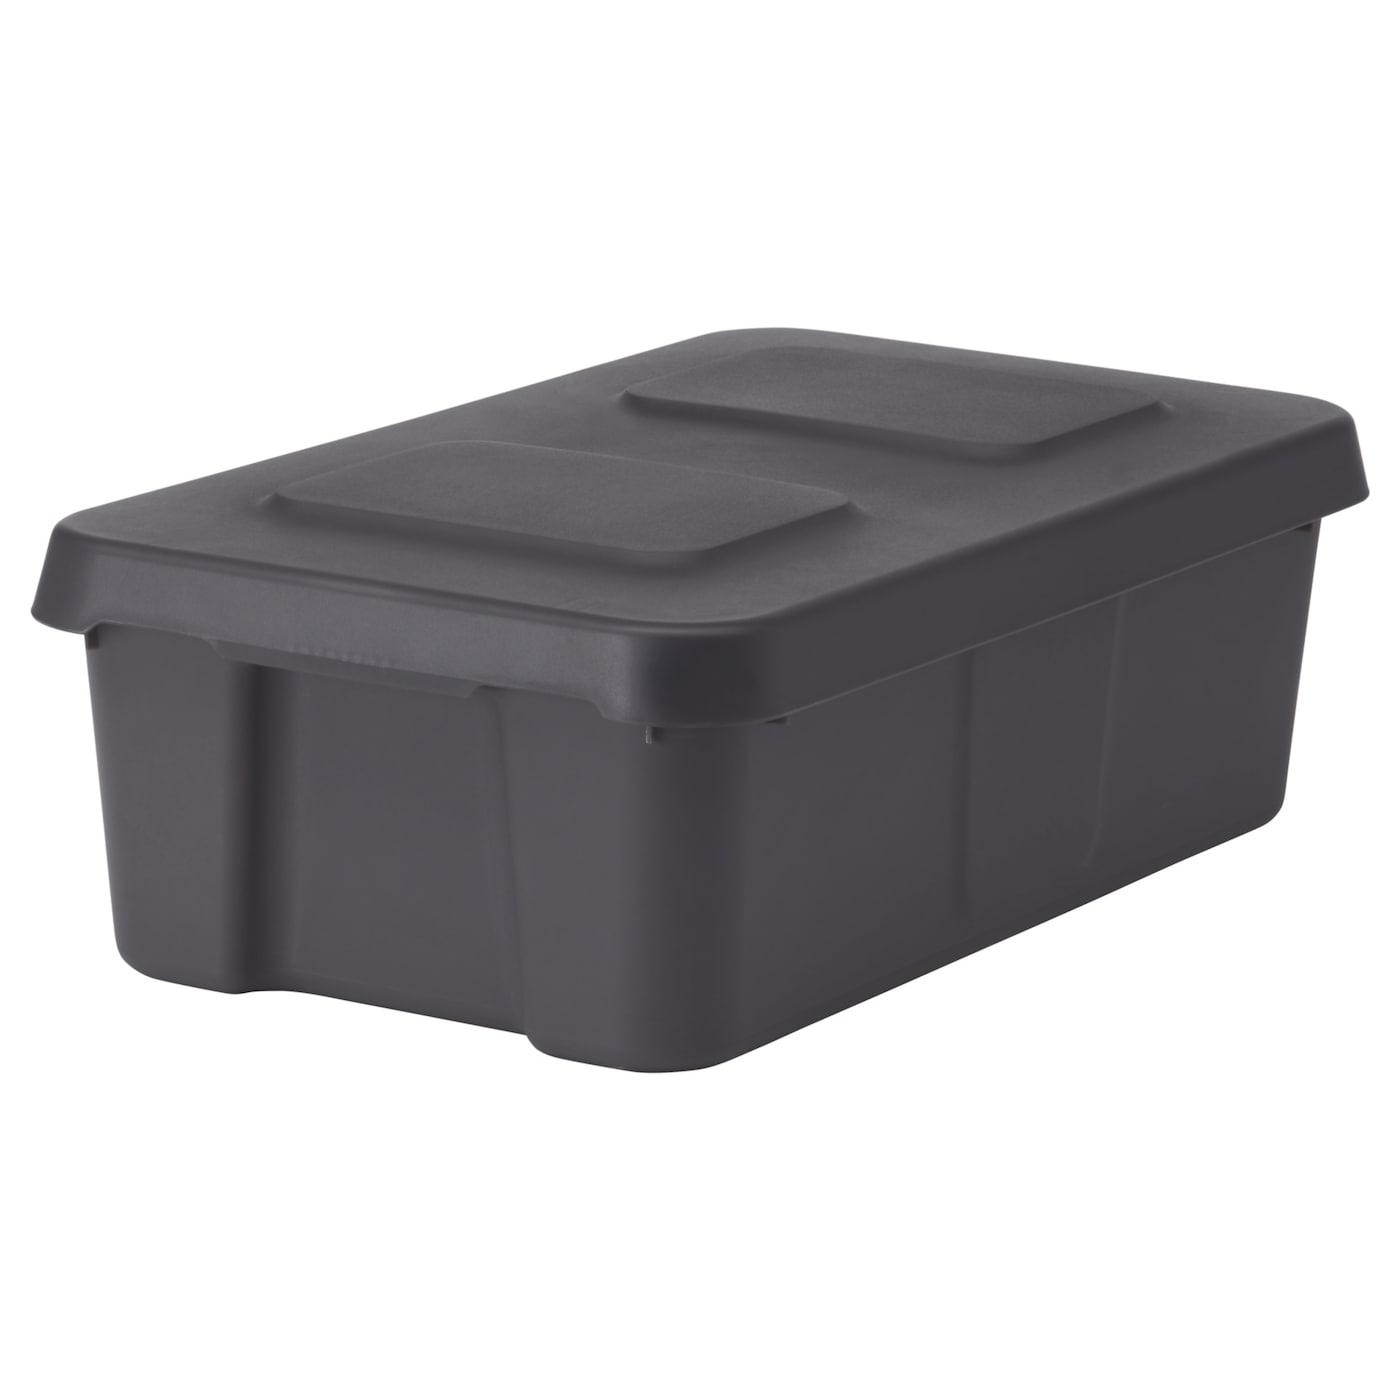 Plastic Cardboard Storage Boxes Ikea Ireland